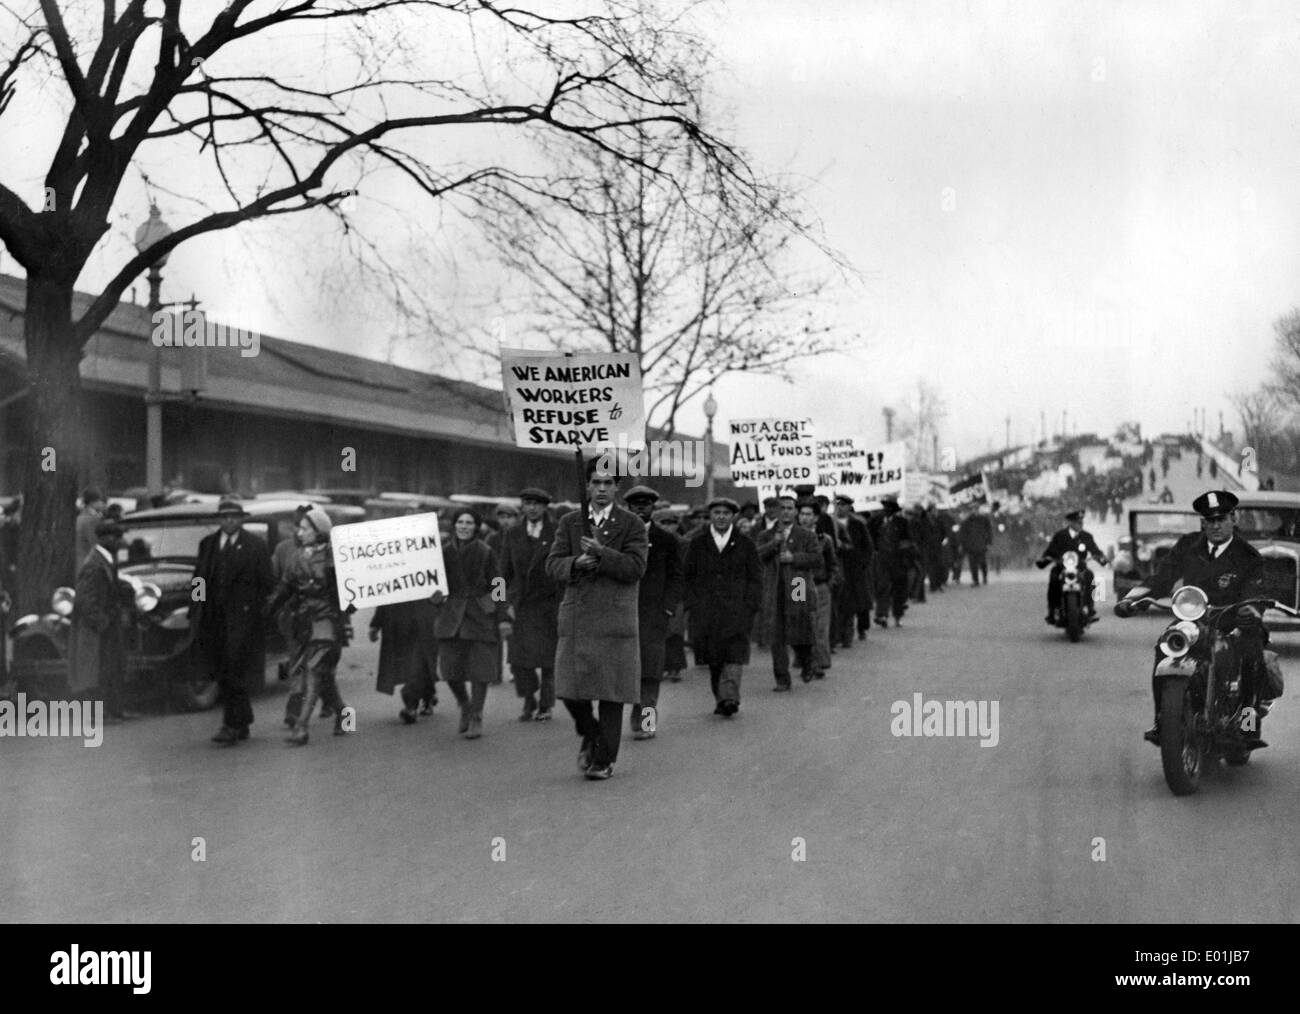 Global economic crisis: Unemployed demonstrators in America Stock Photo